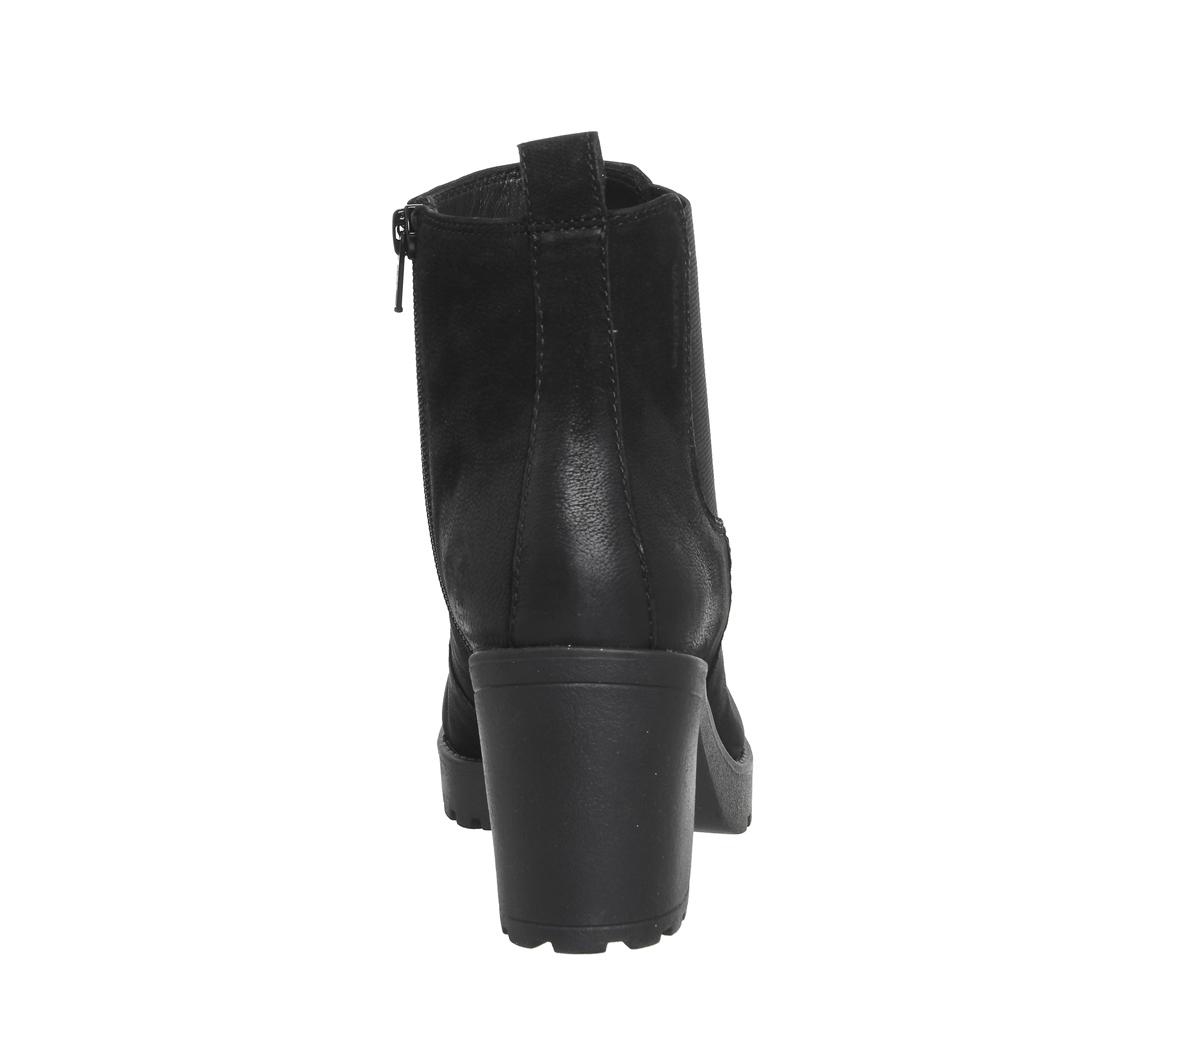 54e29c76e Womens Vagabond Grace Heeled Chelsea Boots Black Nubuck Boots | eBay